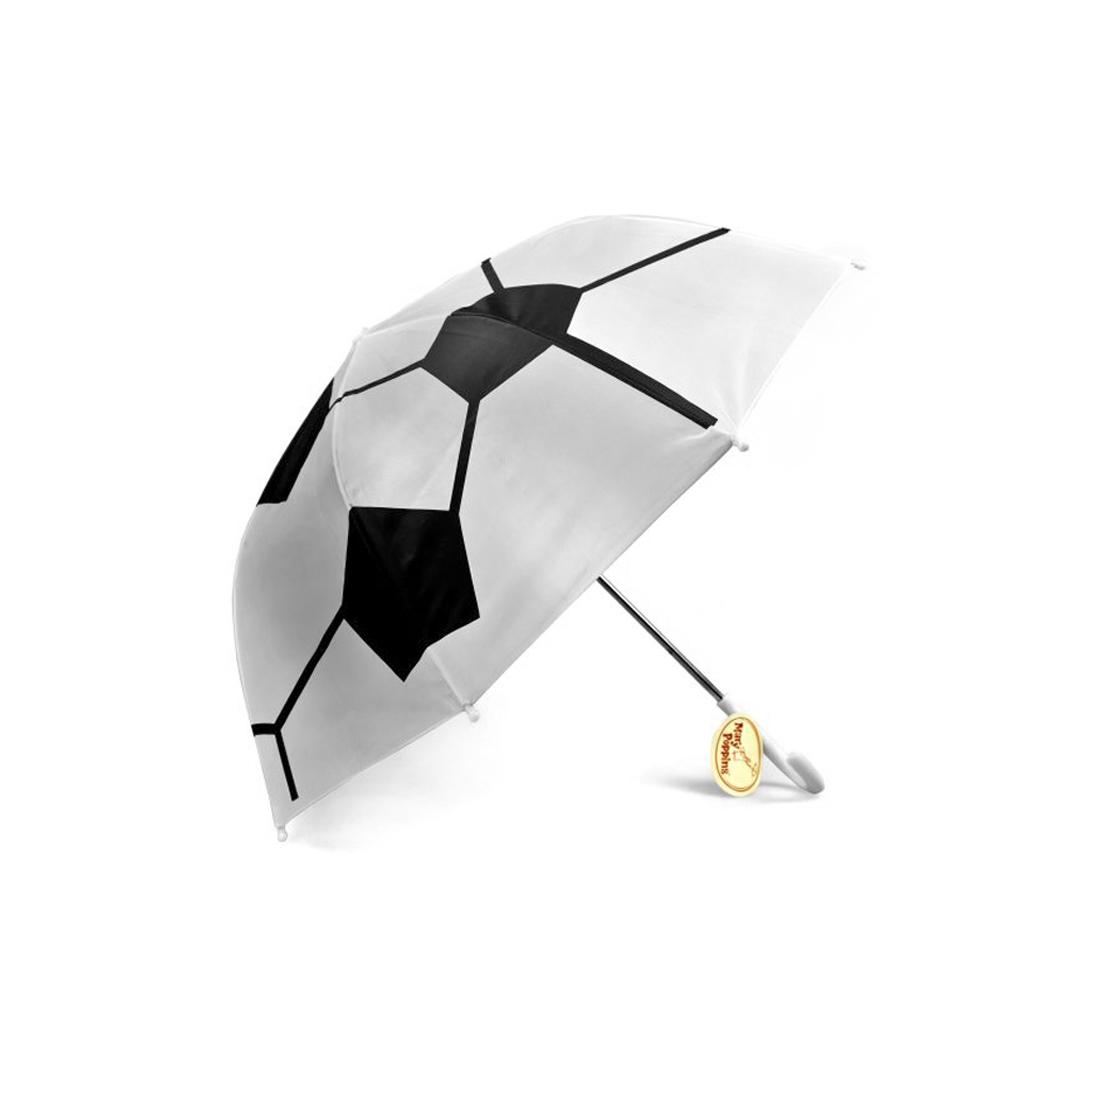 все цены на Зонт Mary Poppins Футбол 46 см онлайн